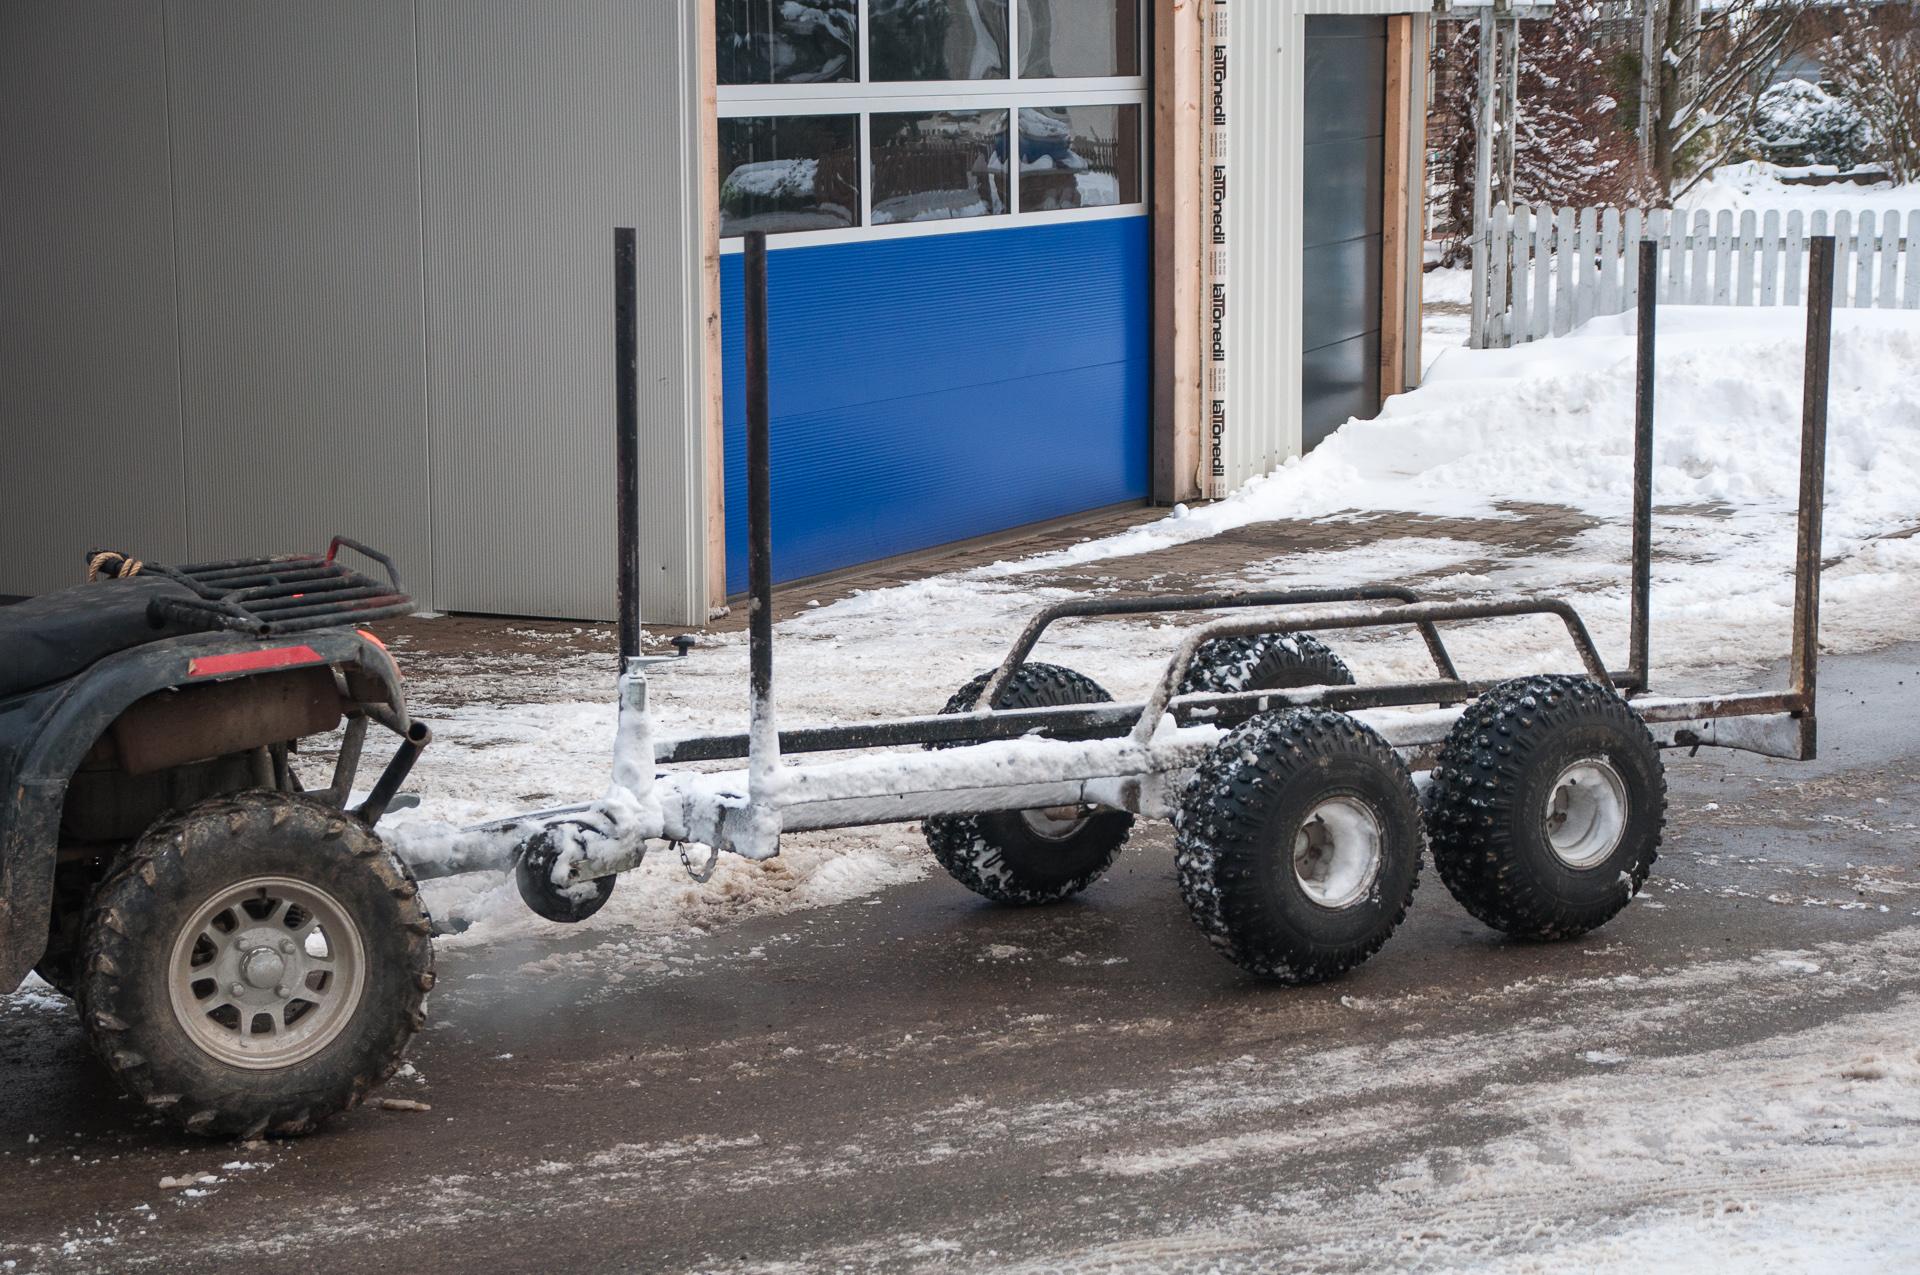 Beliebt Bevorzugt Holzanhänger und Muldenkipper für ATV | Gad net, gibt's net! #ZD_23